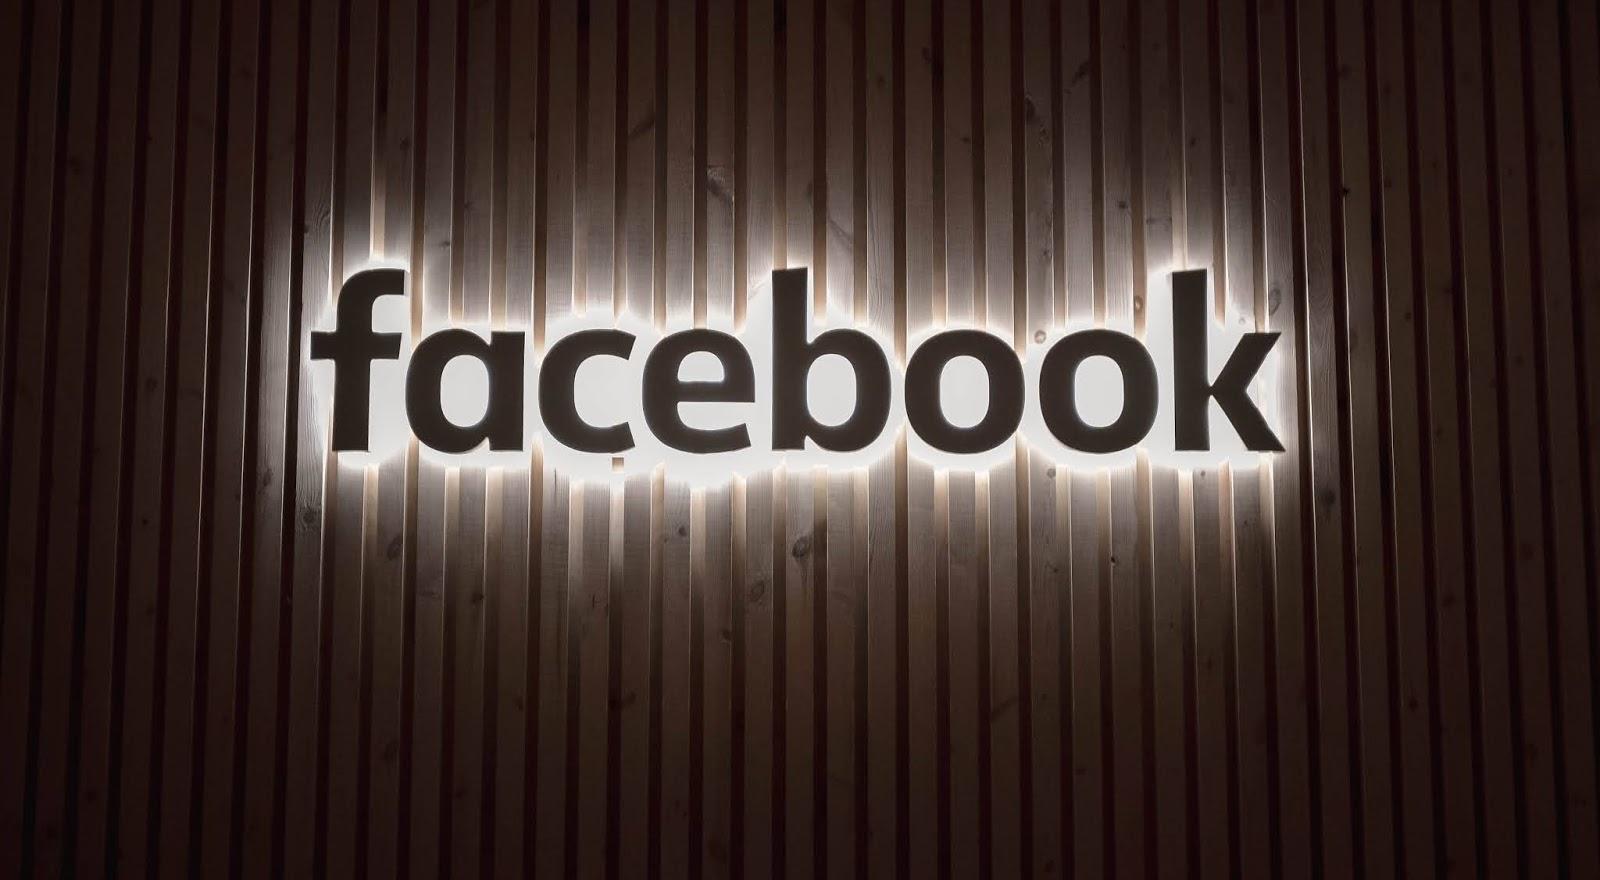 Facebook: Αλλάζει υποχρεωτικά από τον Σεπτέμβριο - Πώς θα είναι